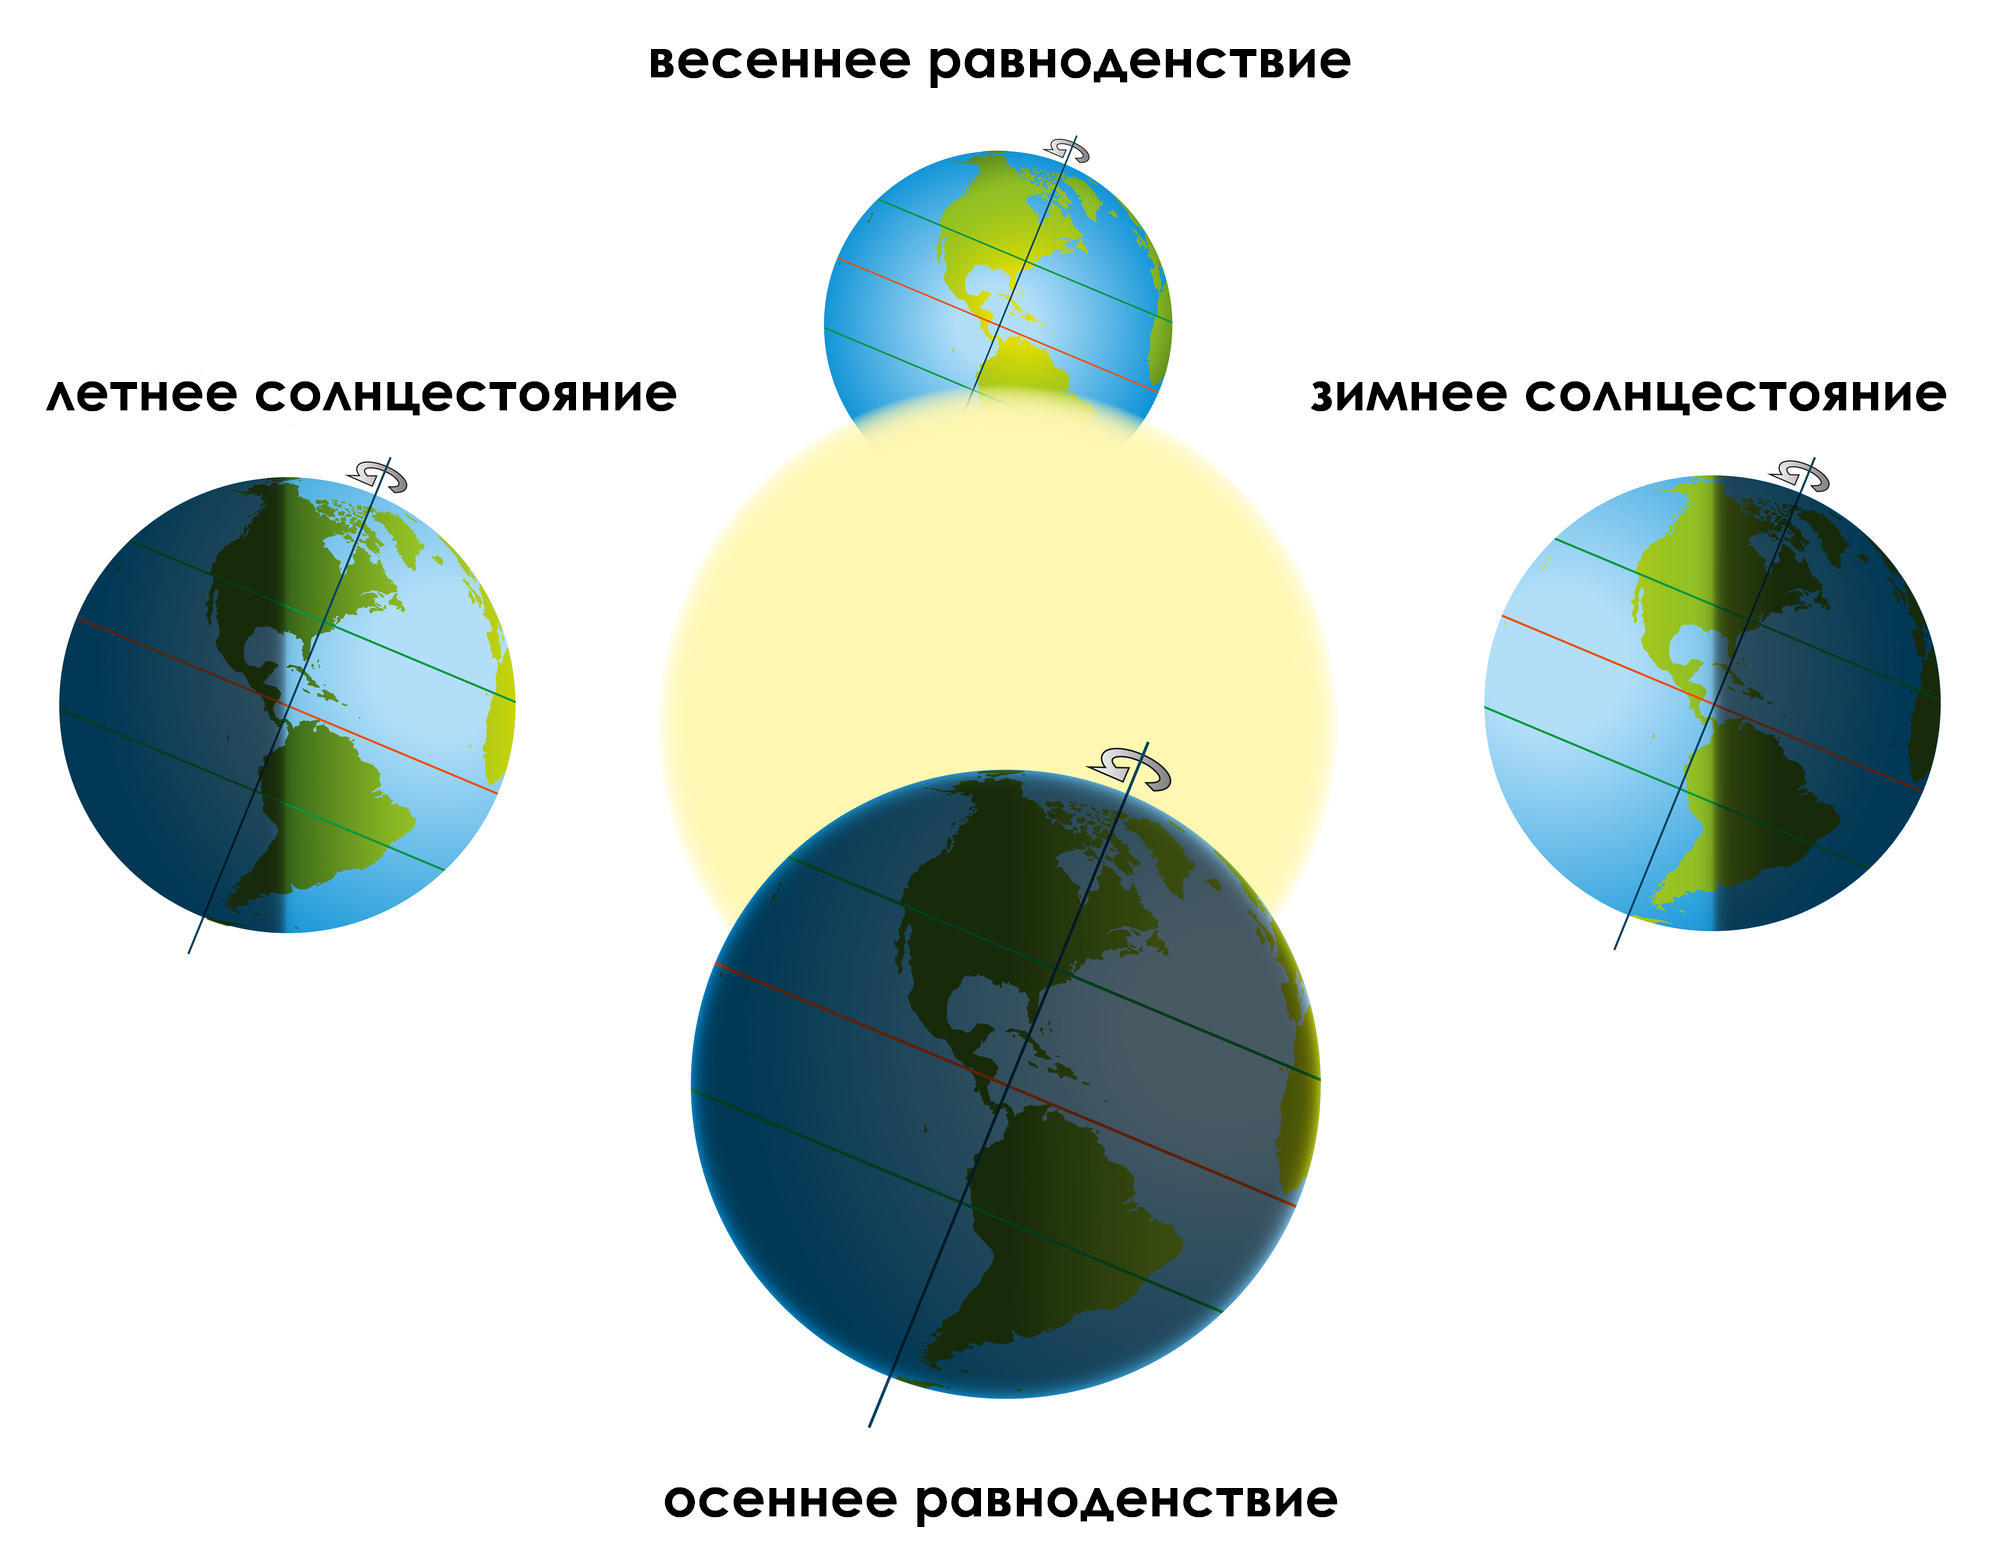 Схема вращения Земли вокруг Солнца